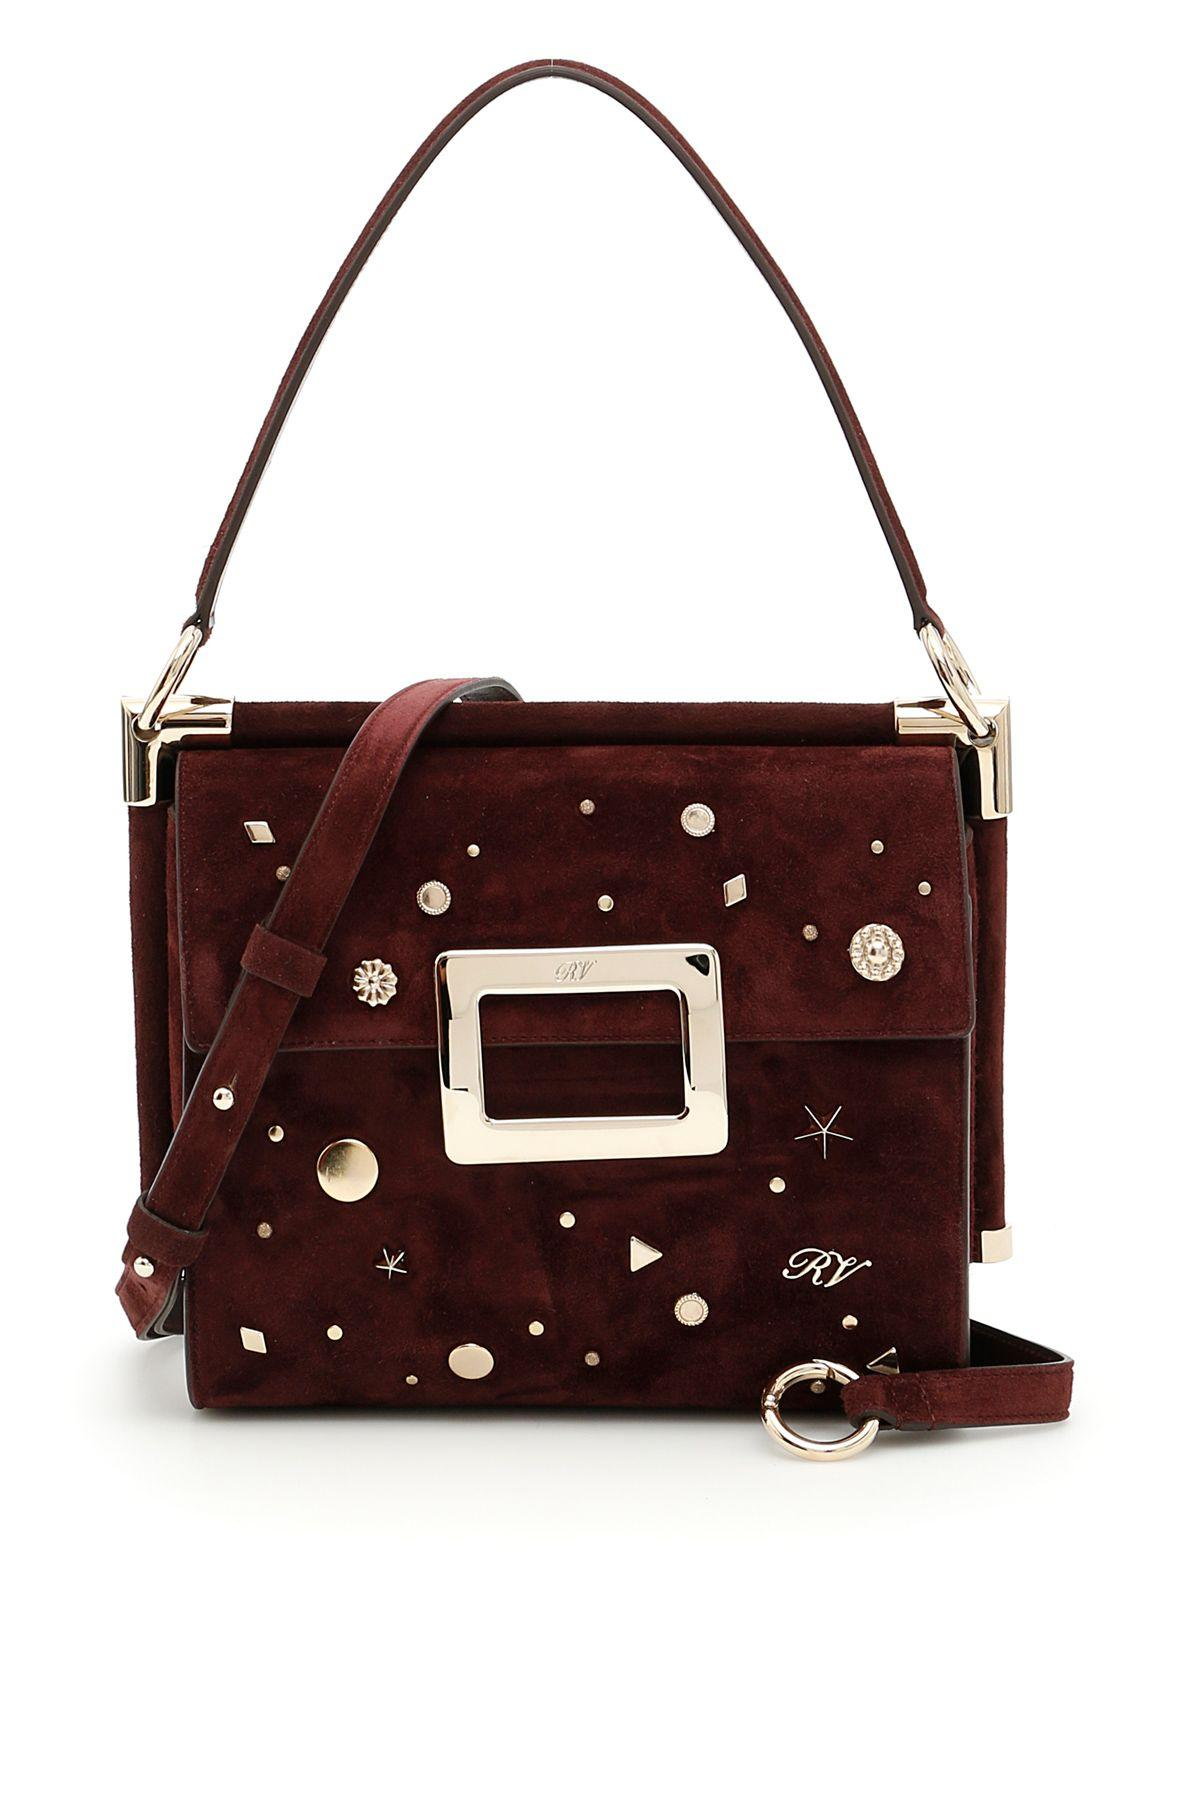 Roger Vivier Miss Viv CarrÉ Small Bag In Kraft|Rosso